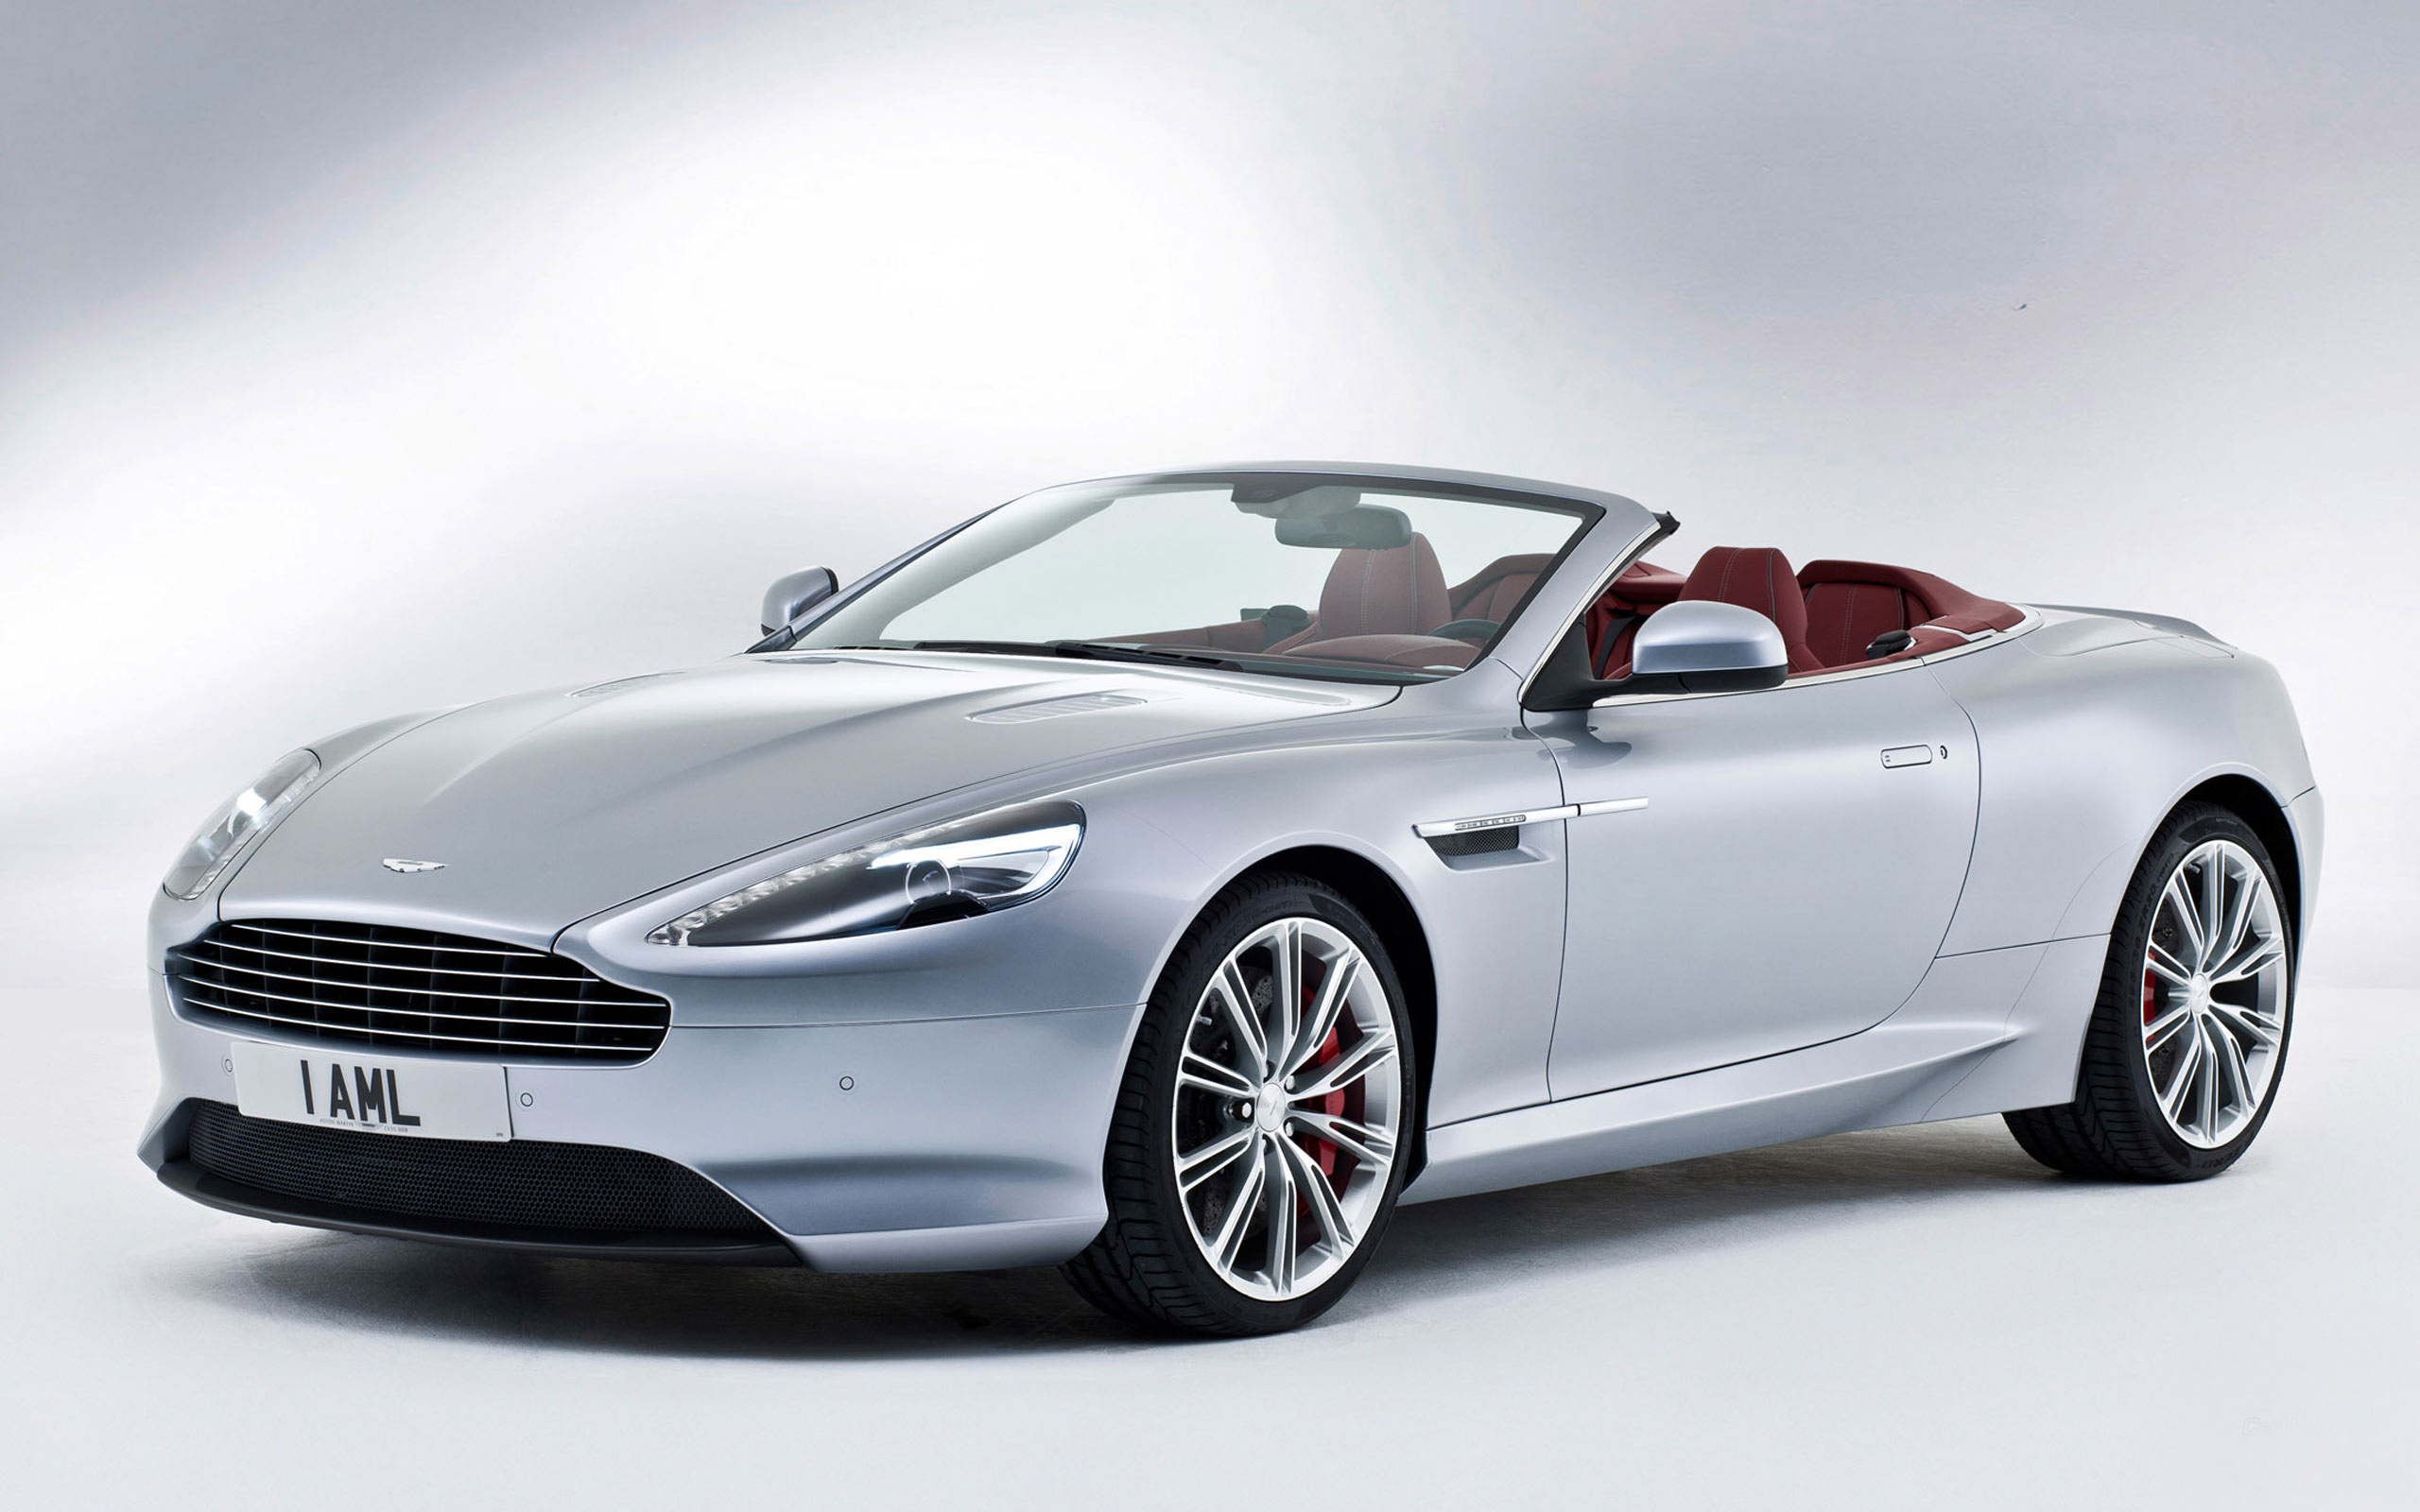 Aston Martin Cars 5 Free Wallpaper